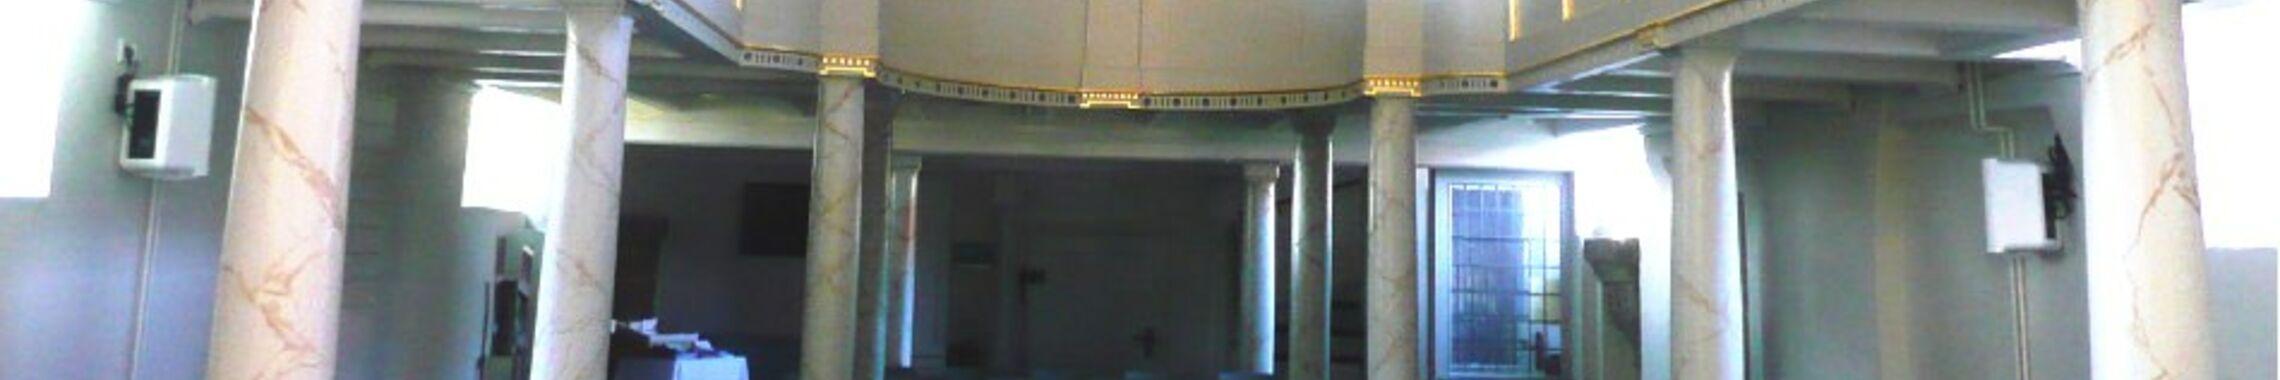 Innenraum Kirche Holle